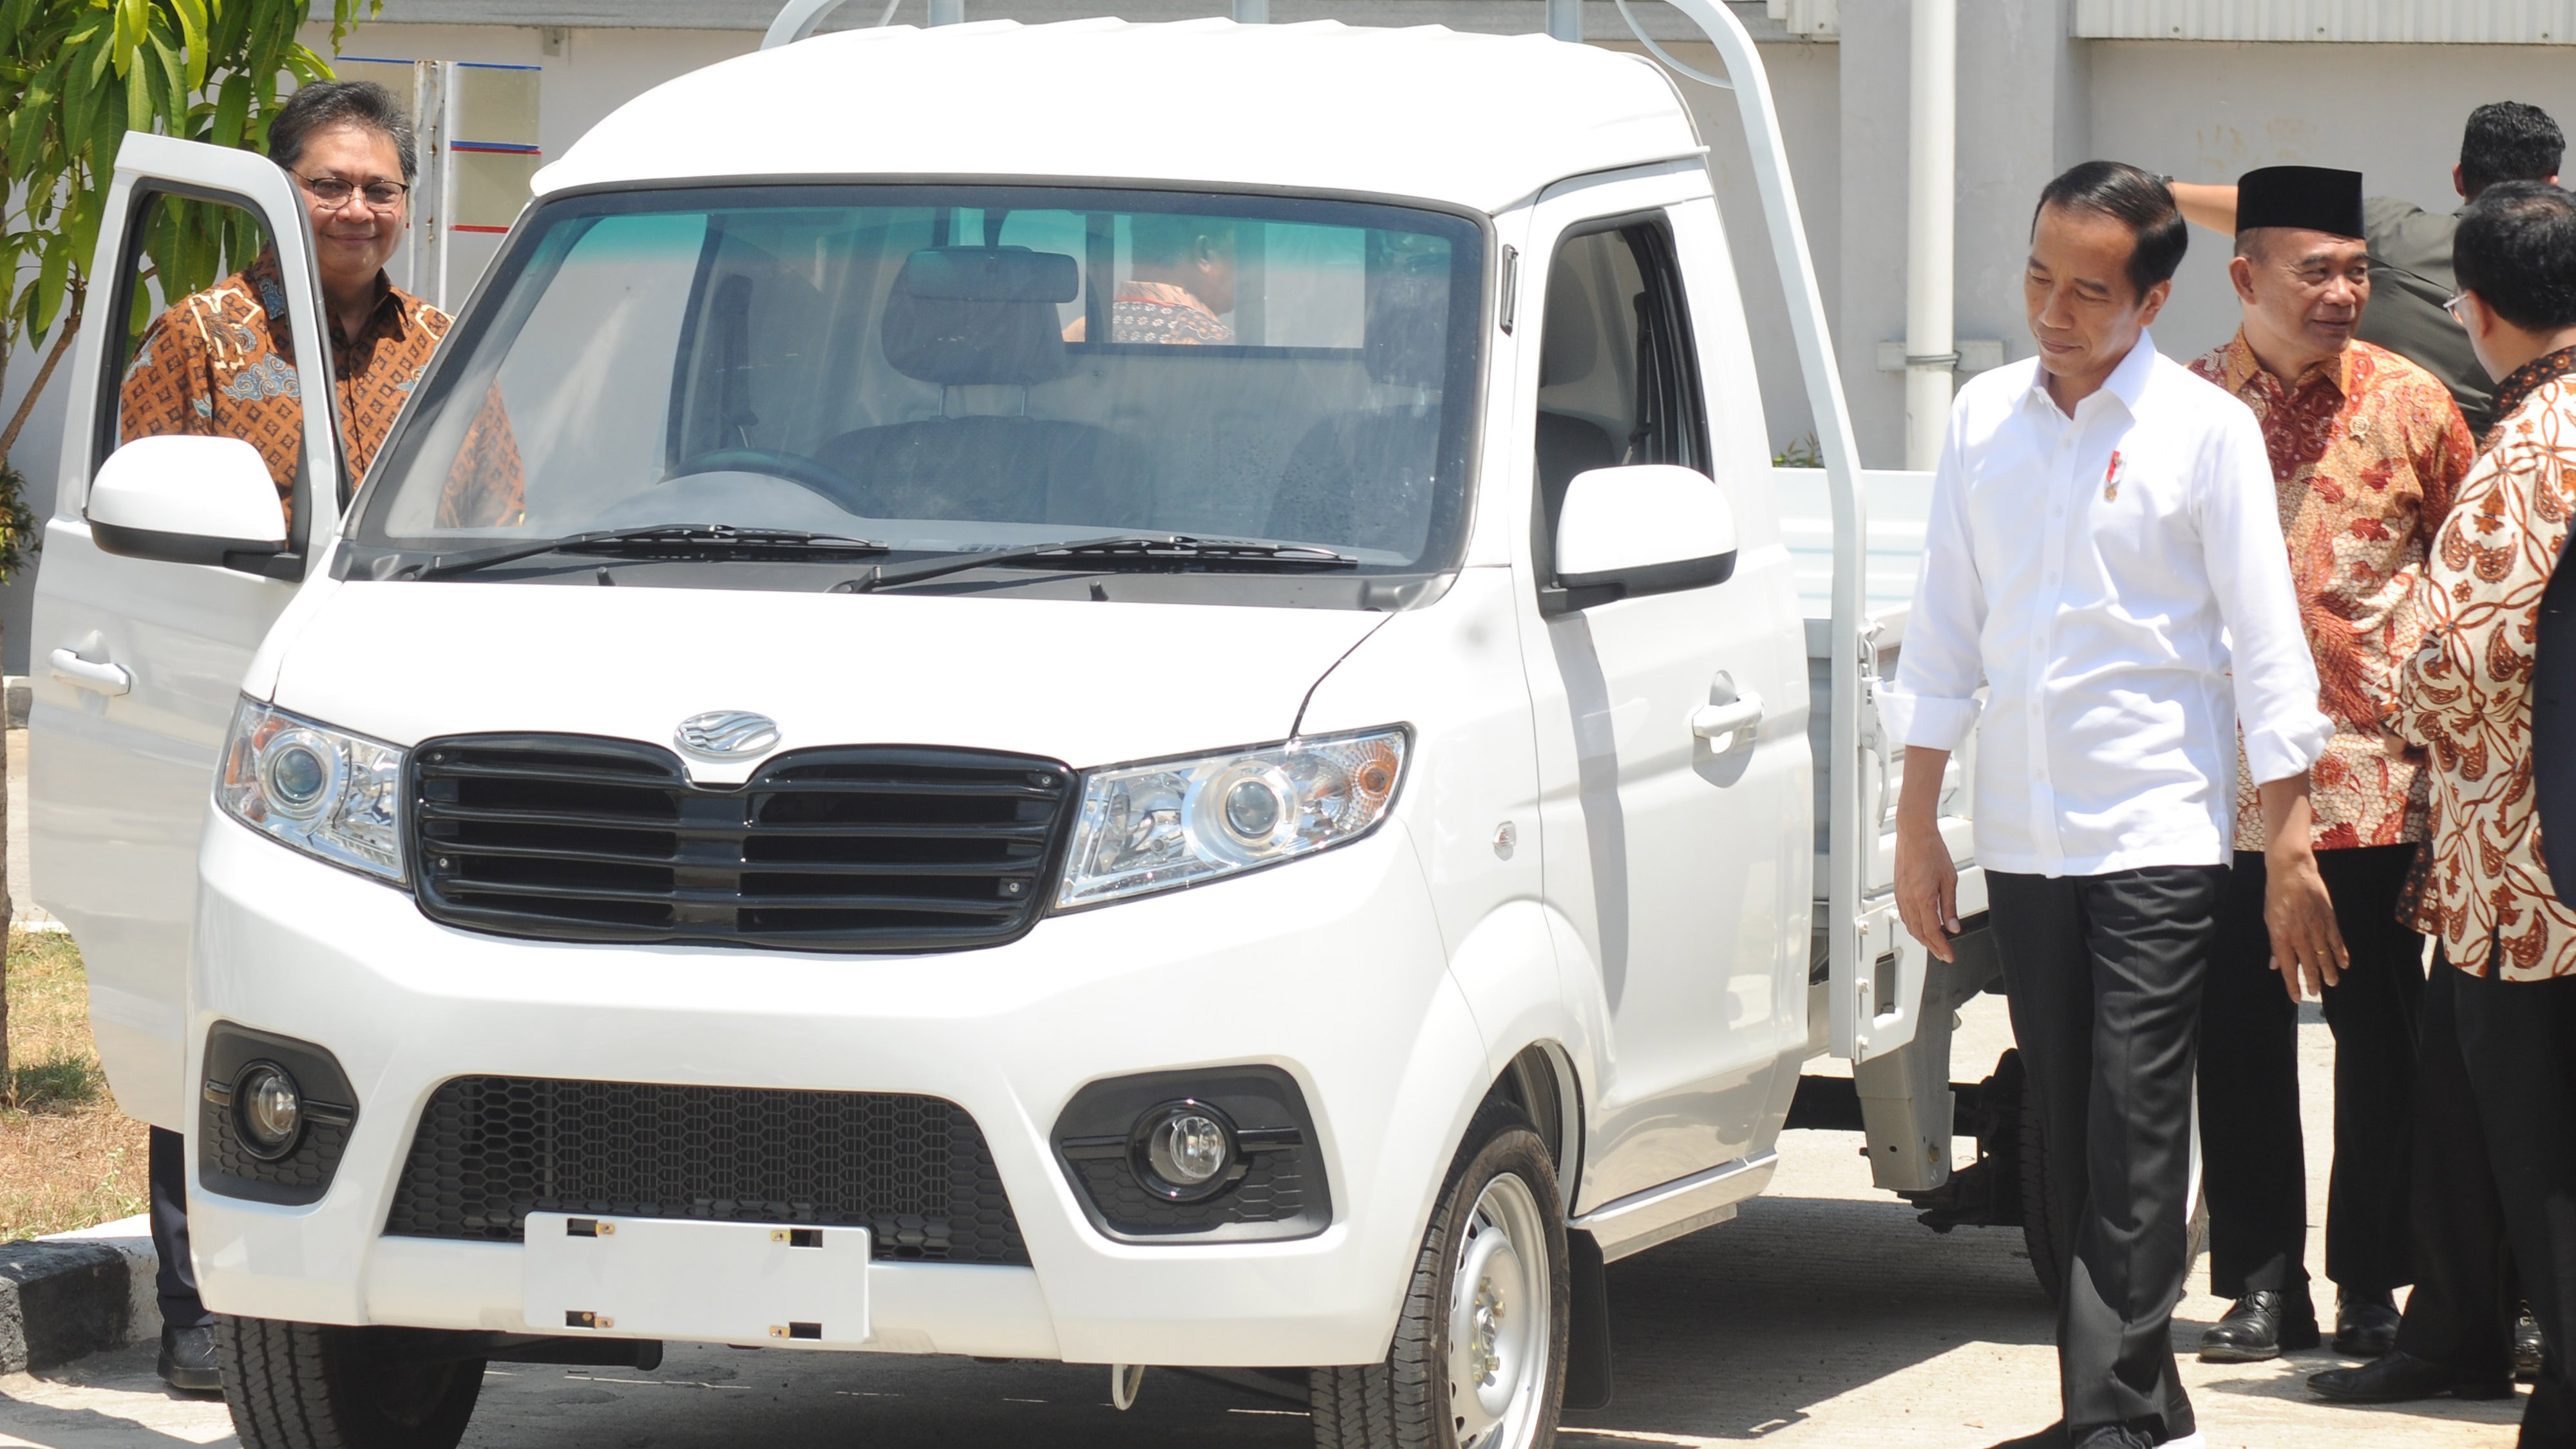 Presiden Jokowi resmikan mobil Esemka.